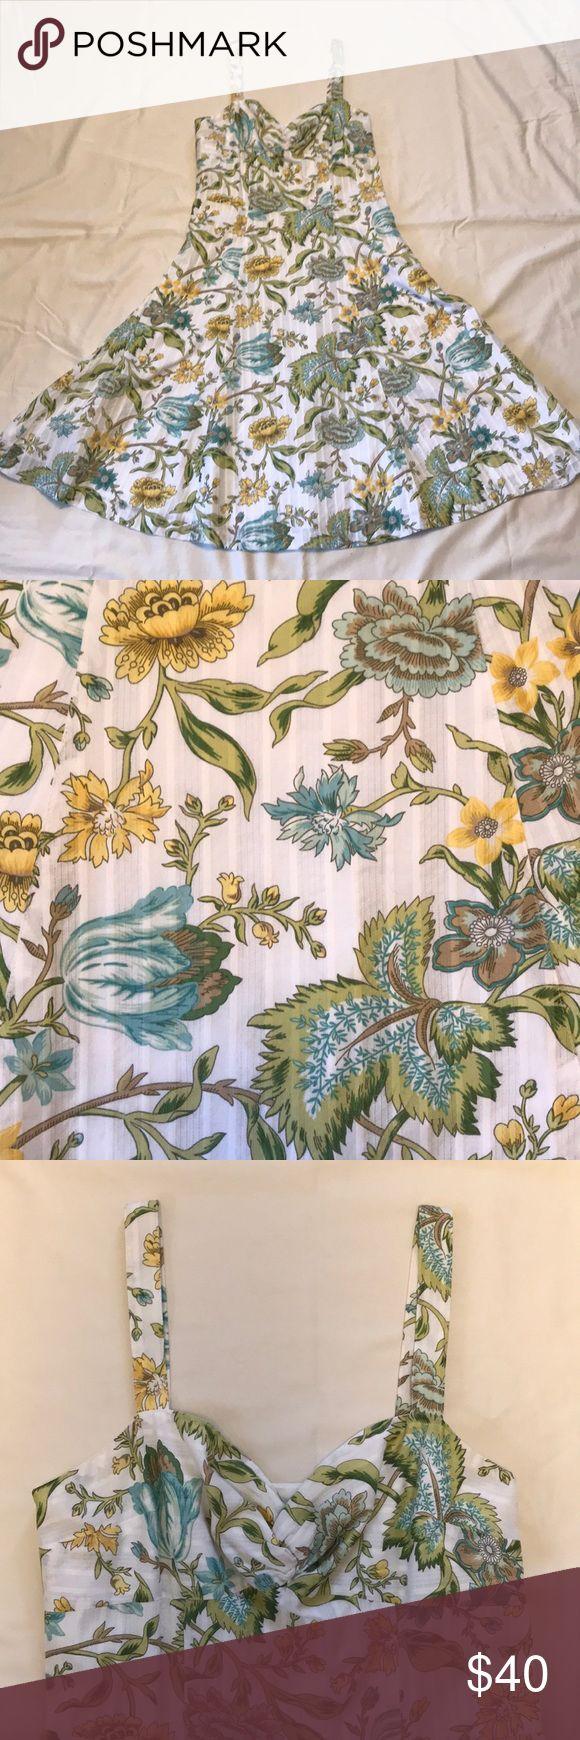 Halter neck maxi dress loft wallpaper